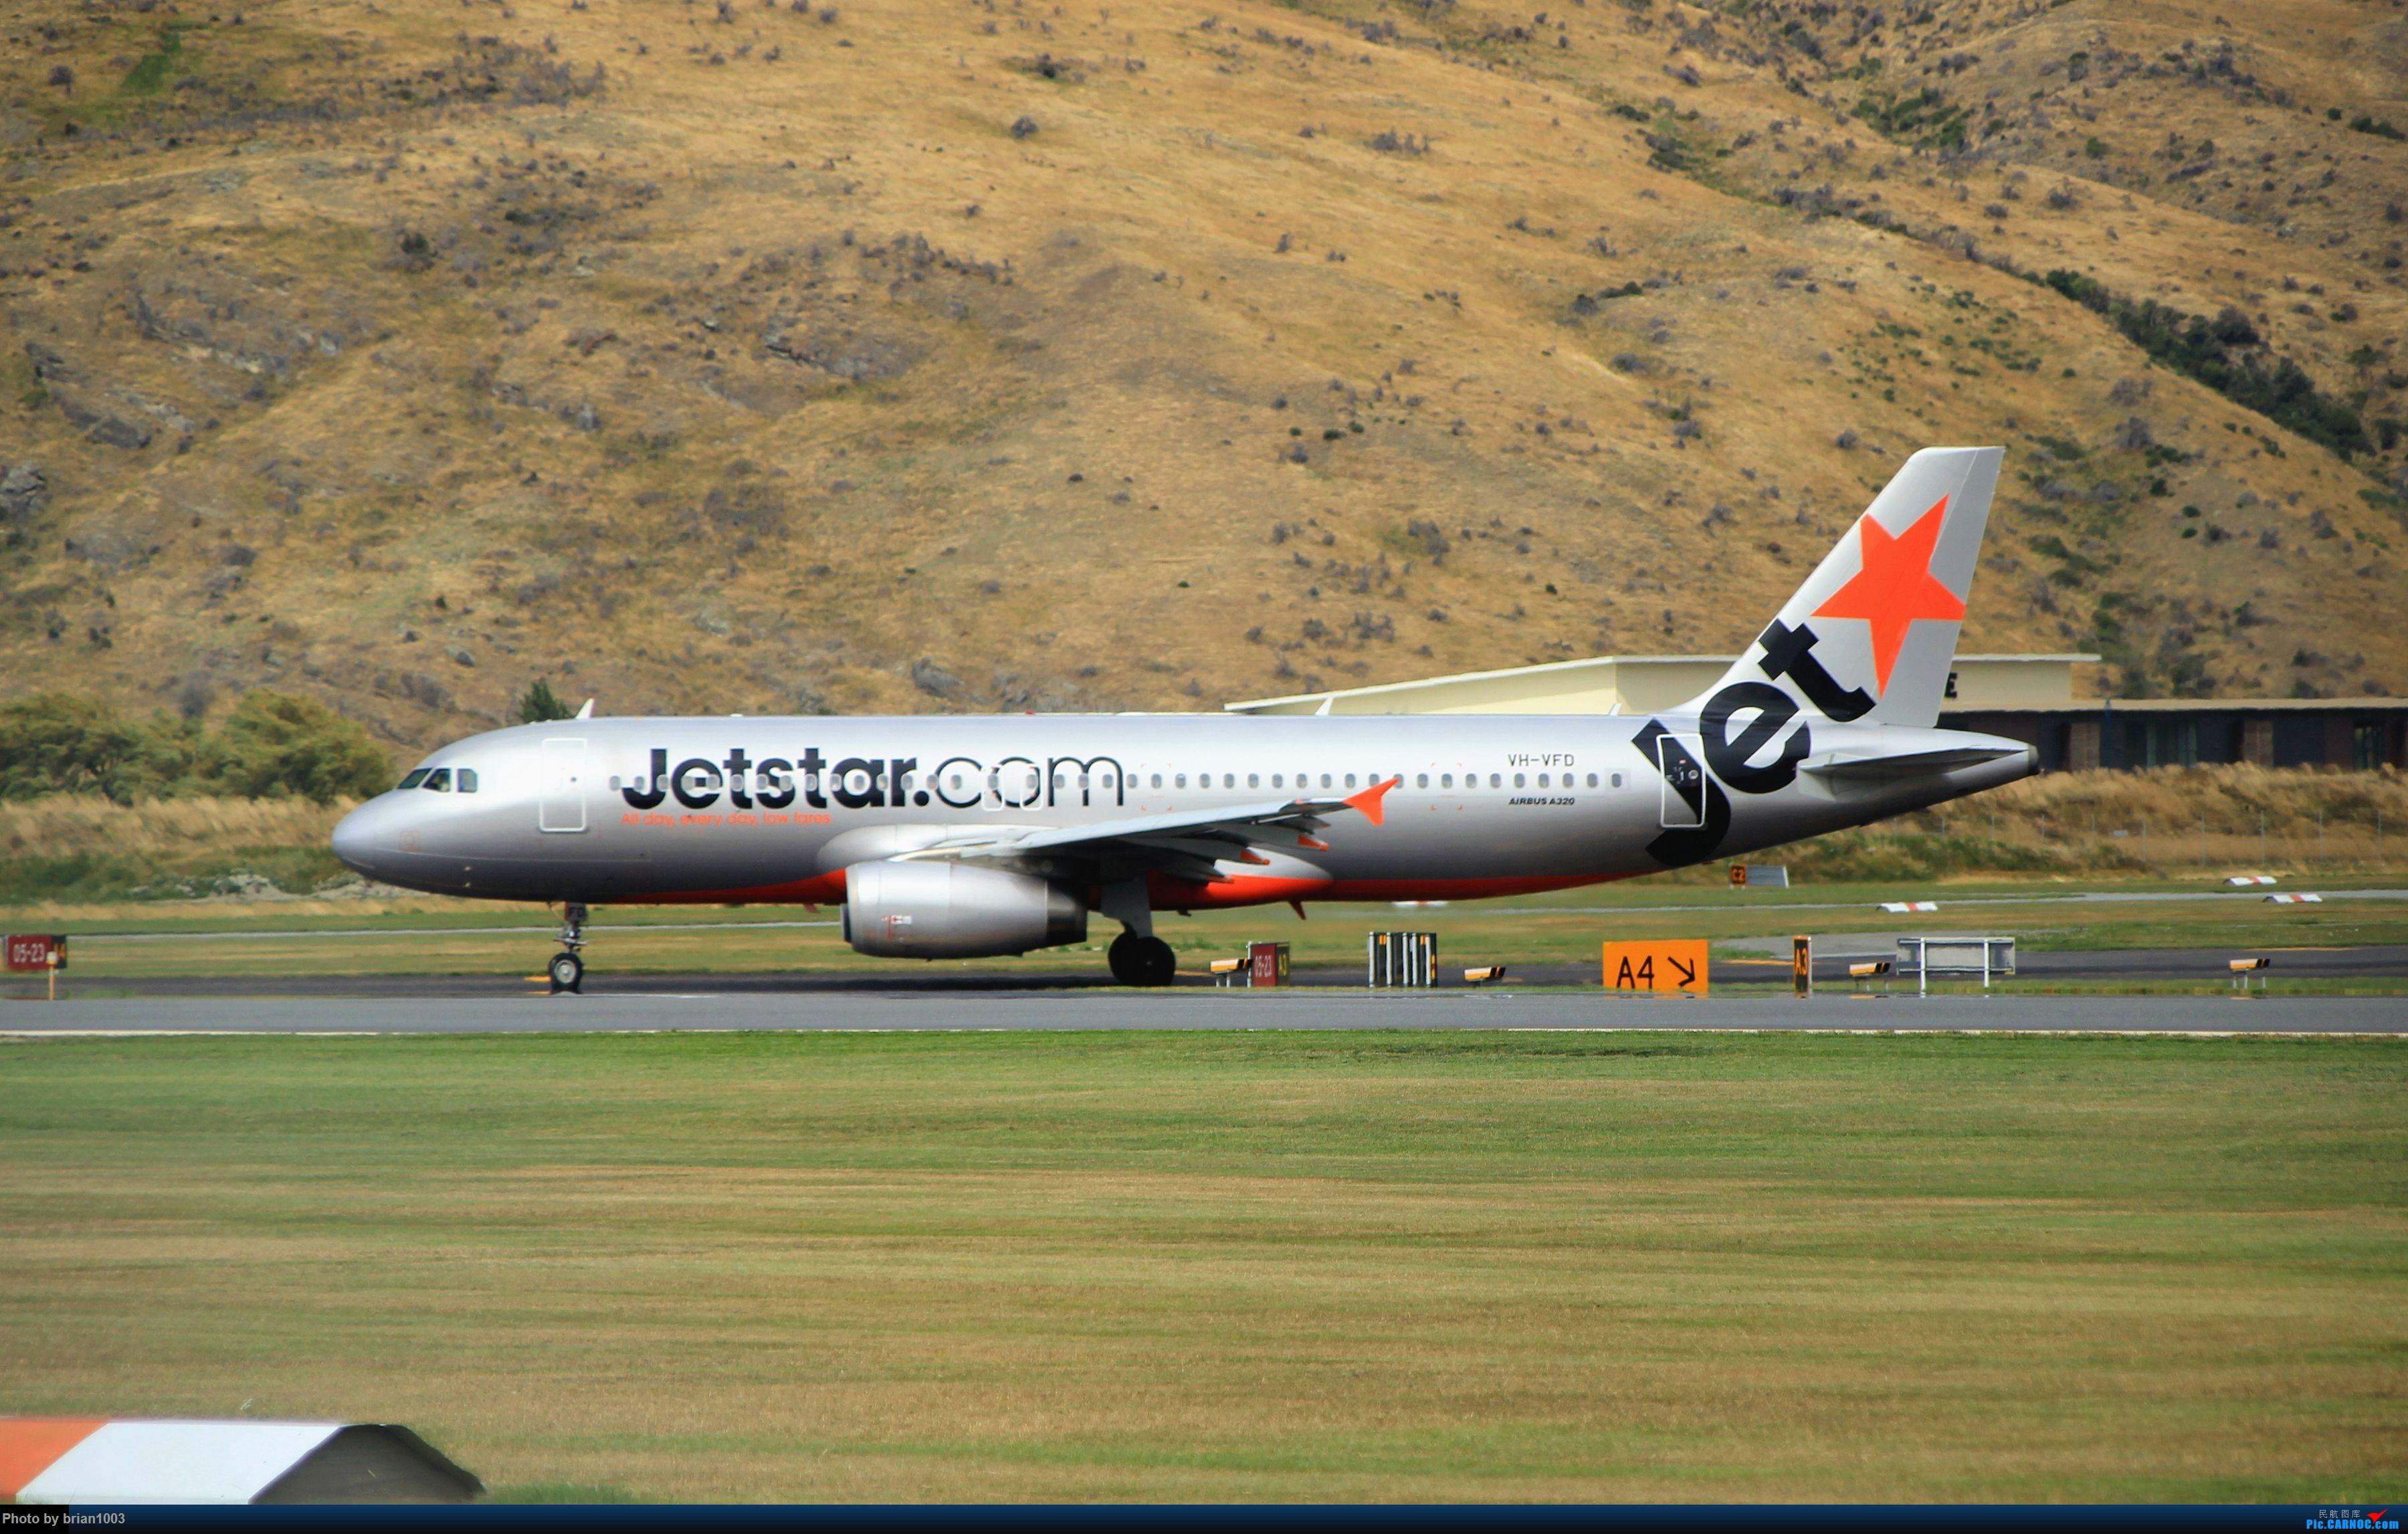 Re:[原创]CZ3347-CZ617-JQ292-CZ306-CZ659,中土之国屌丝舱自驾流水账 AIRBUS A320 VH-VFD